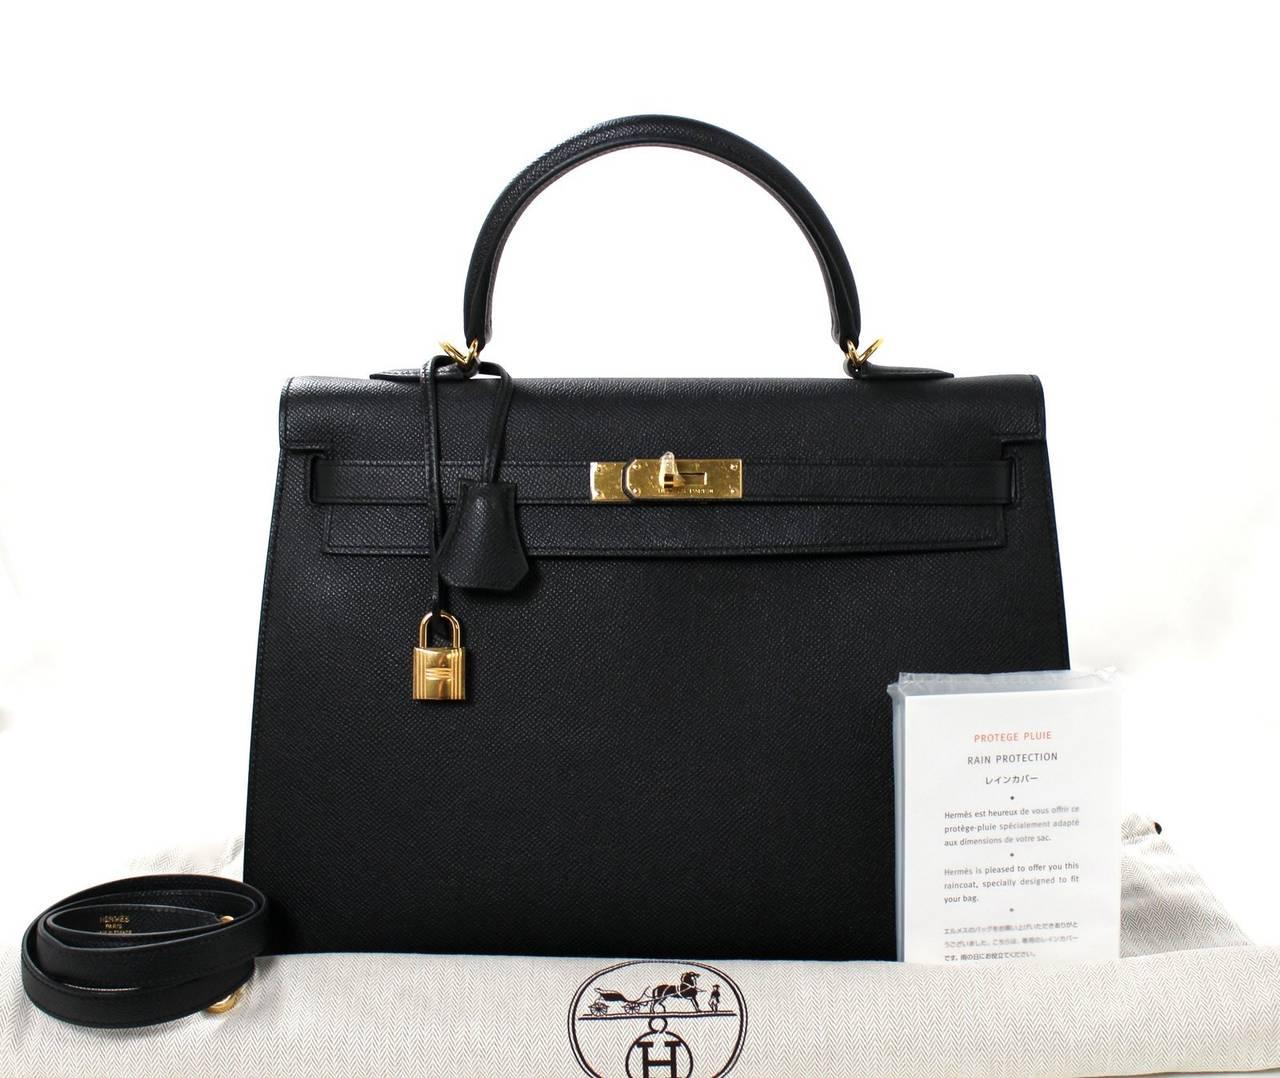 Hermes Black Kelly Sellier- Epsom Leather GHW  in 35 cm size 10